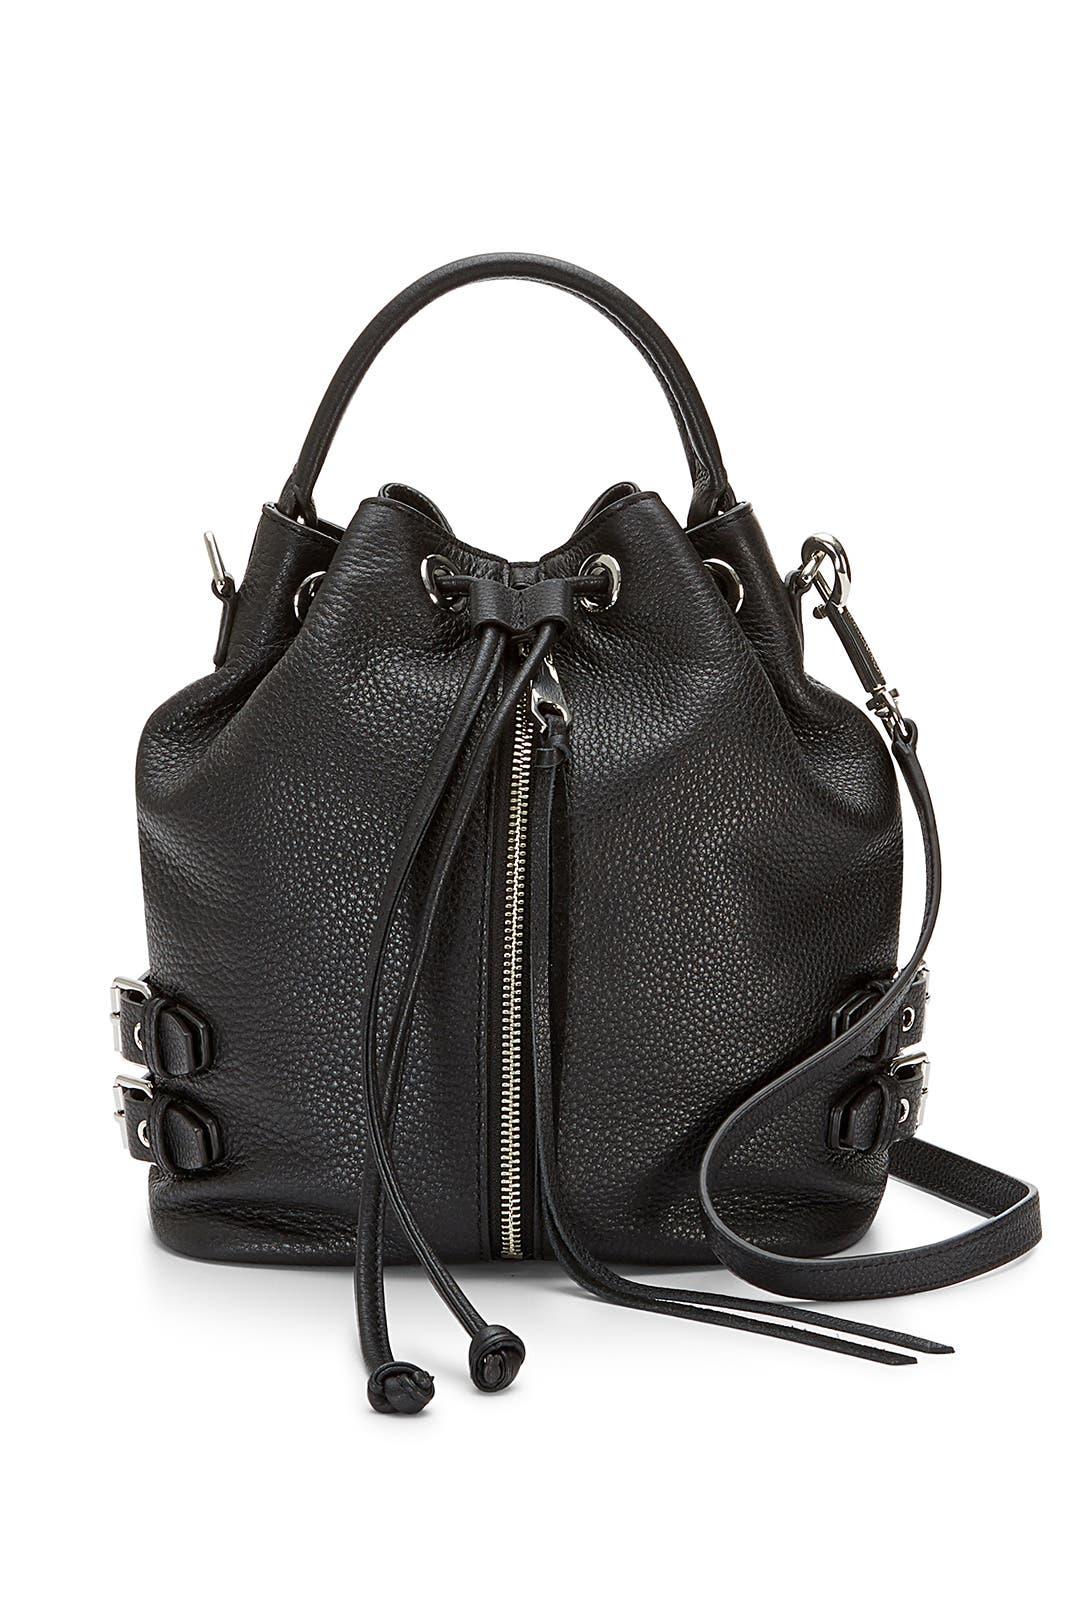 Black Moto Bucket Bag by Rebecca Minkoff Handbags